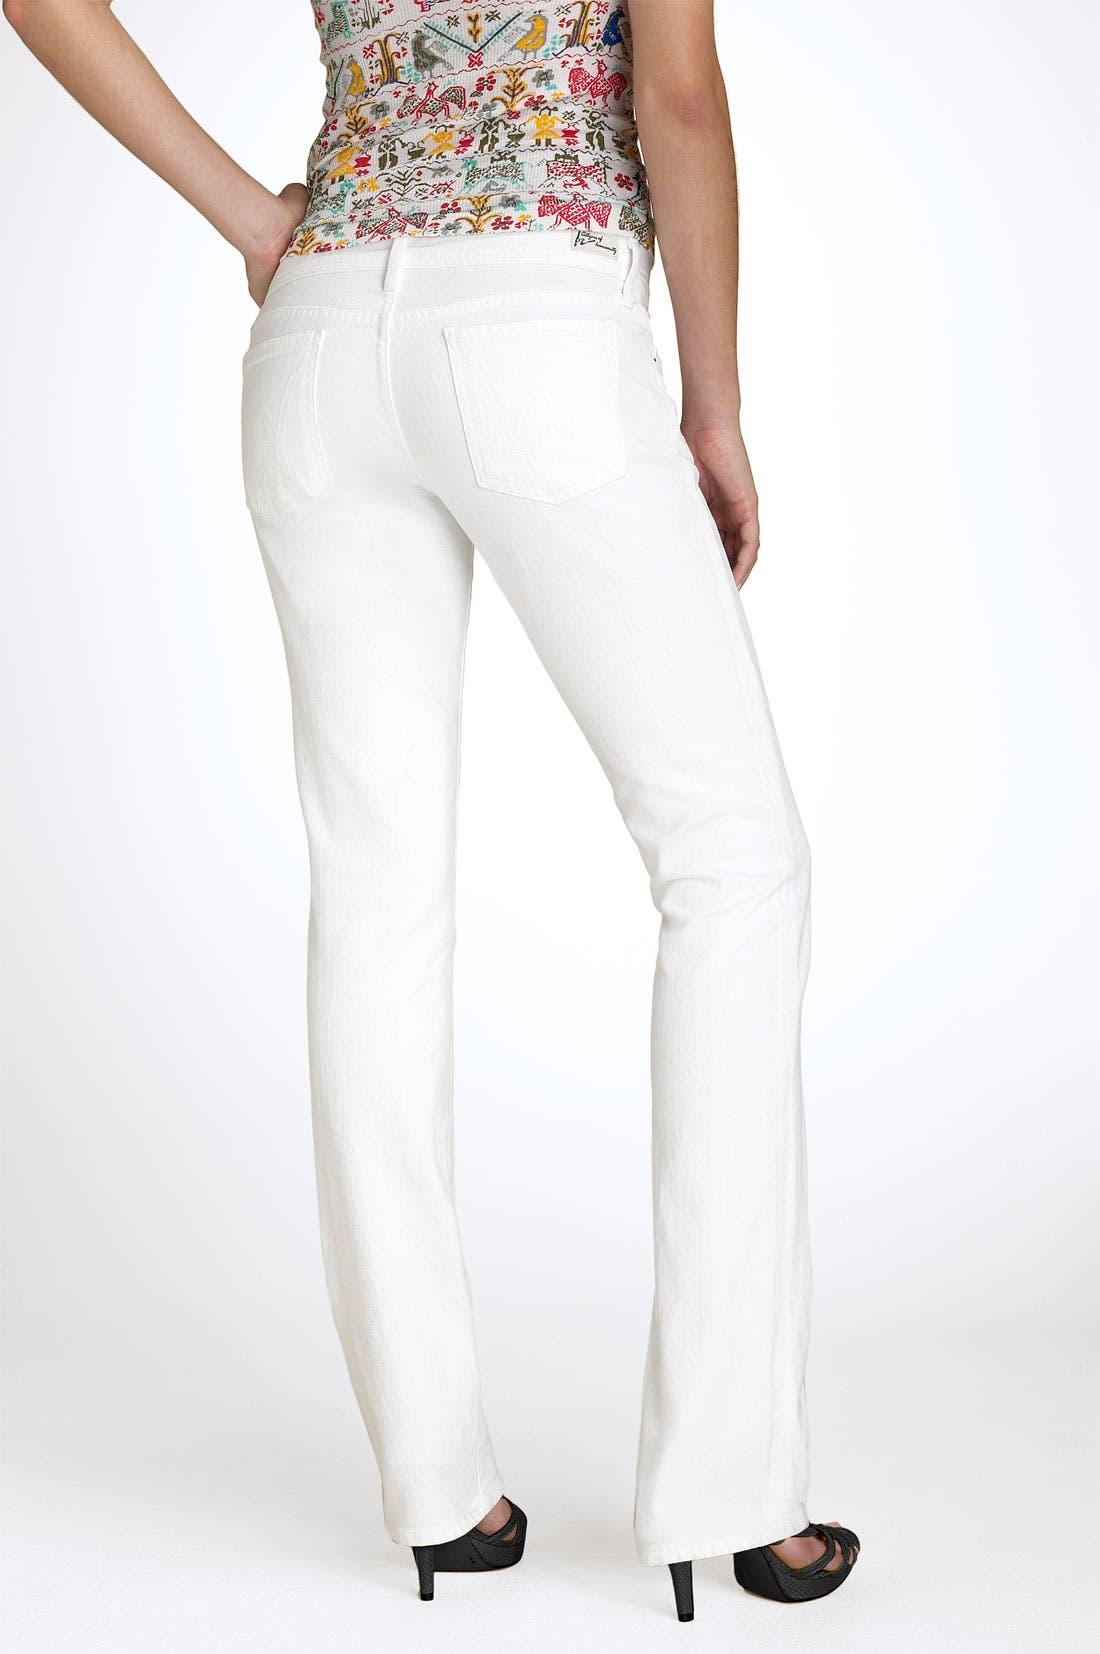 Main Image - Citizens of Humanity 'Ava' Straight Leg Stretch Jeans (Santorini White Wash)